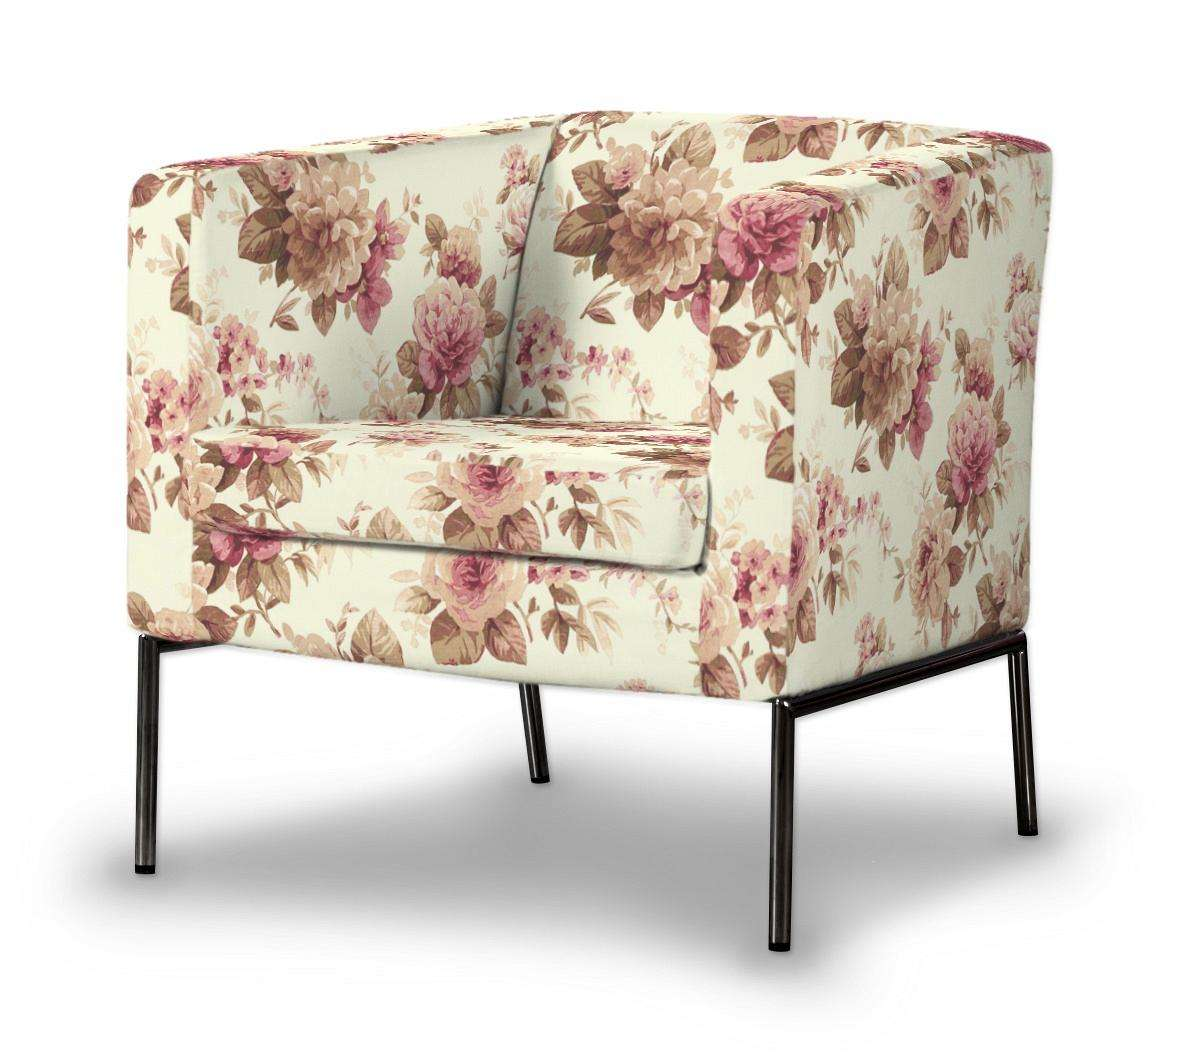 Pokrowiec na fotel Klappsta Fotel Klappsta w kolekcji Mirella, tkanina: 141-06